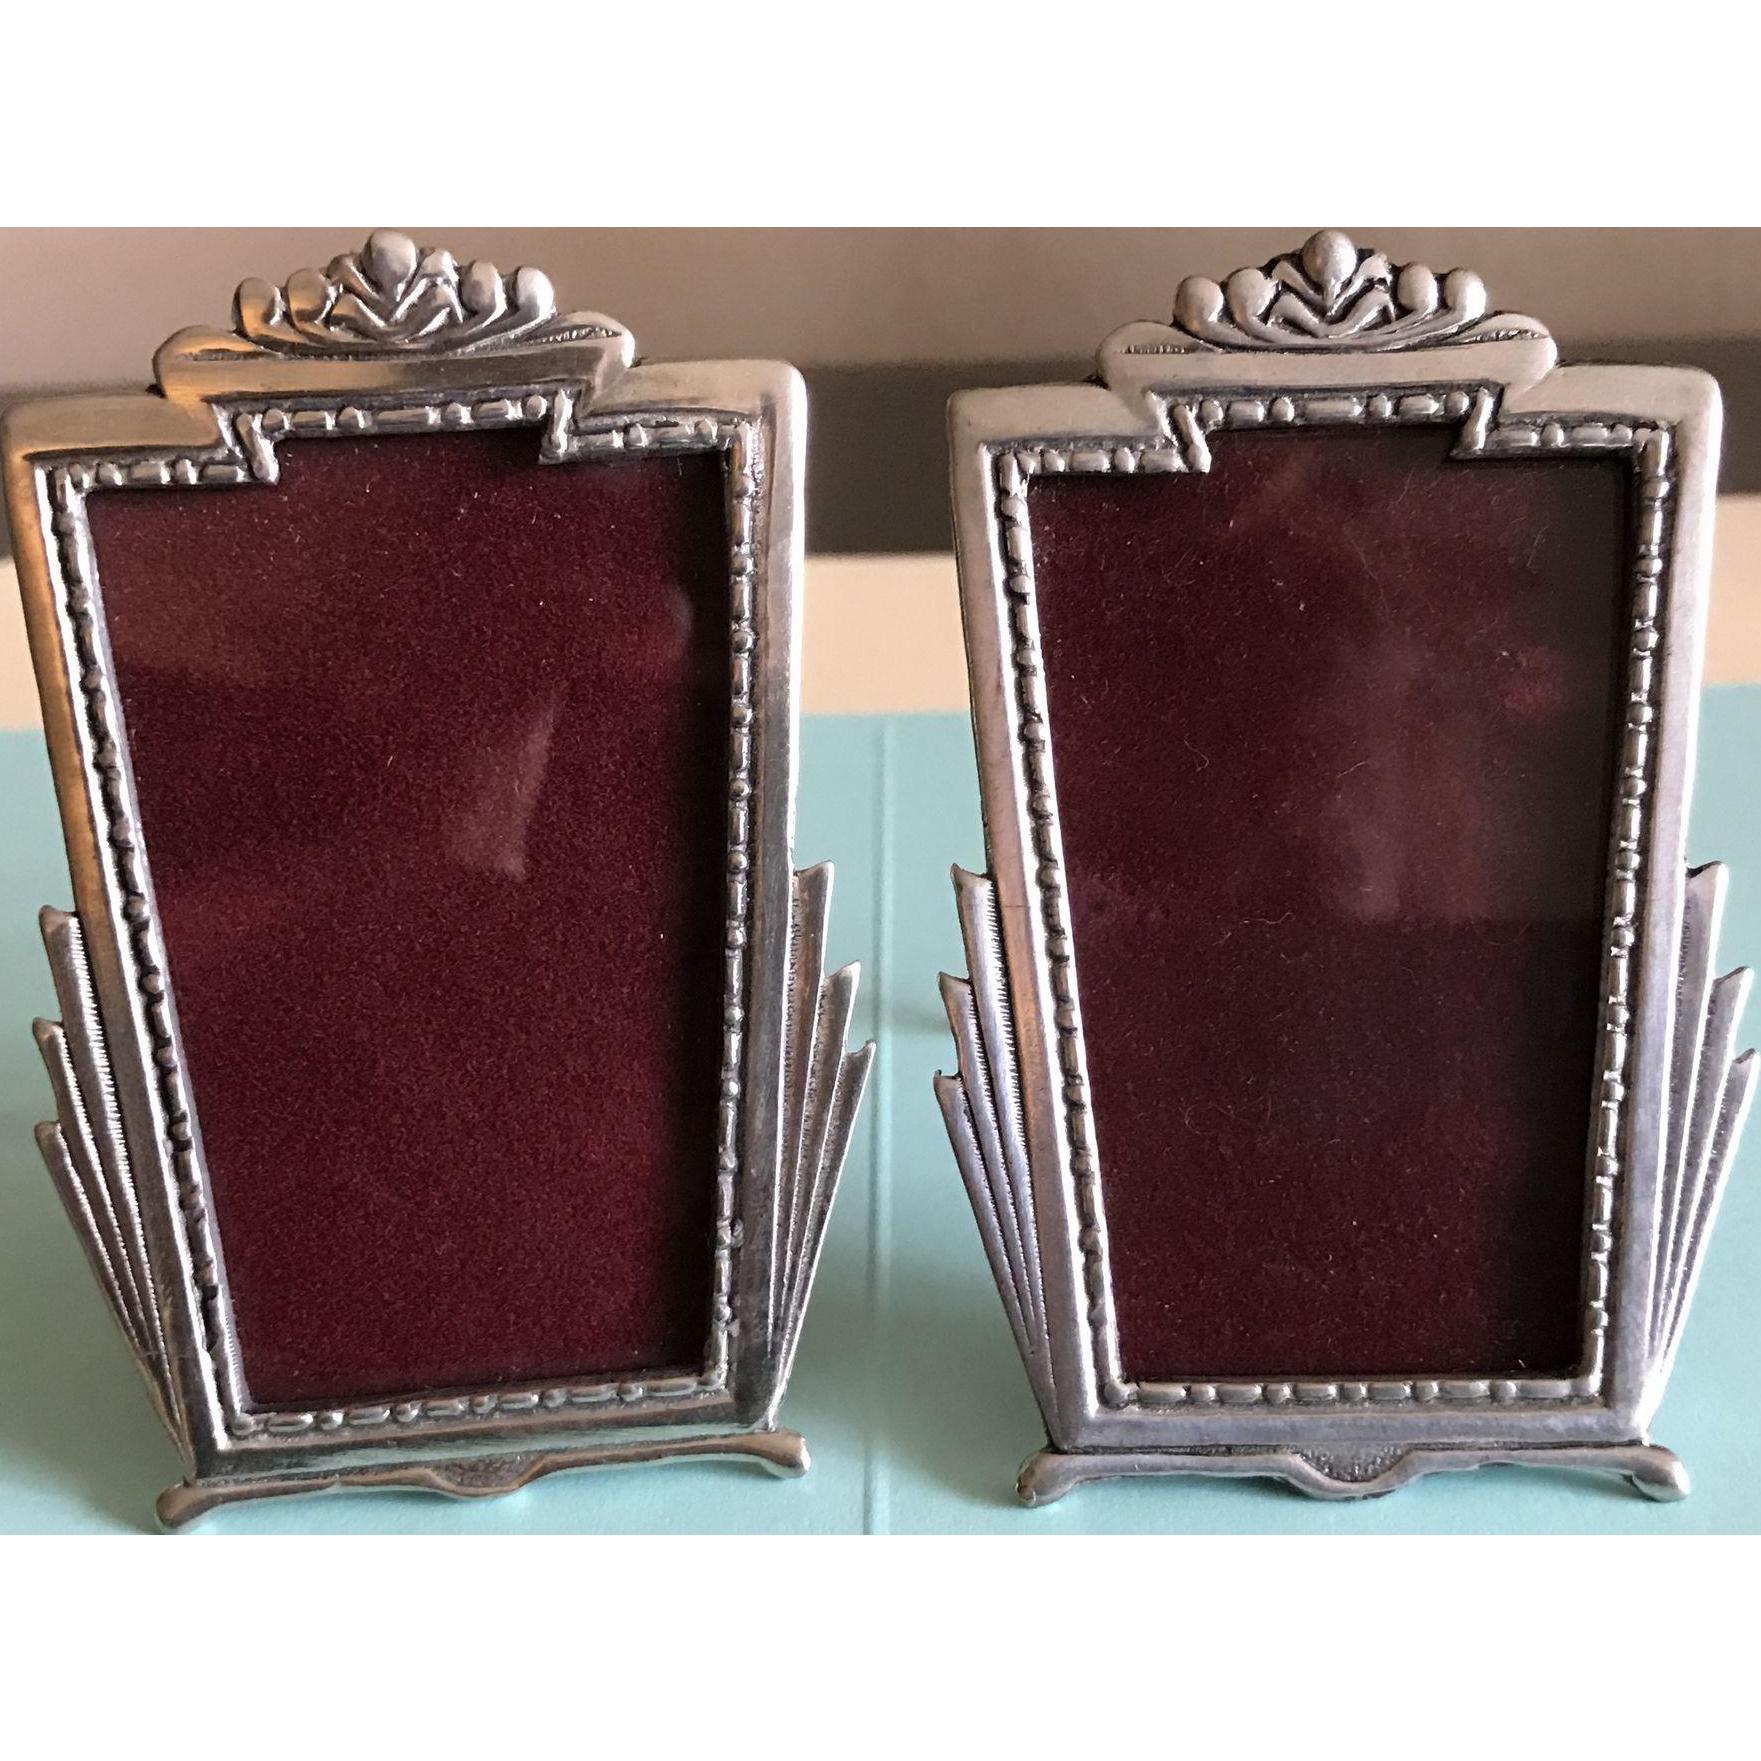 2 Vintage Pewter picture frames by Elias Artmetal New York